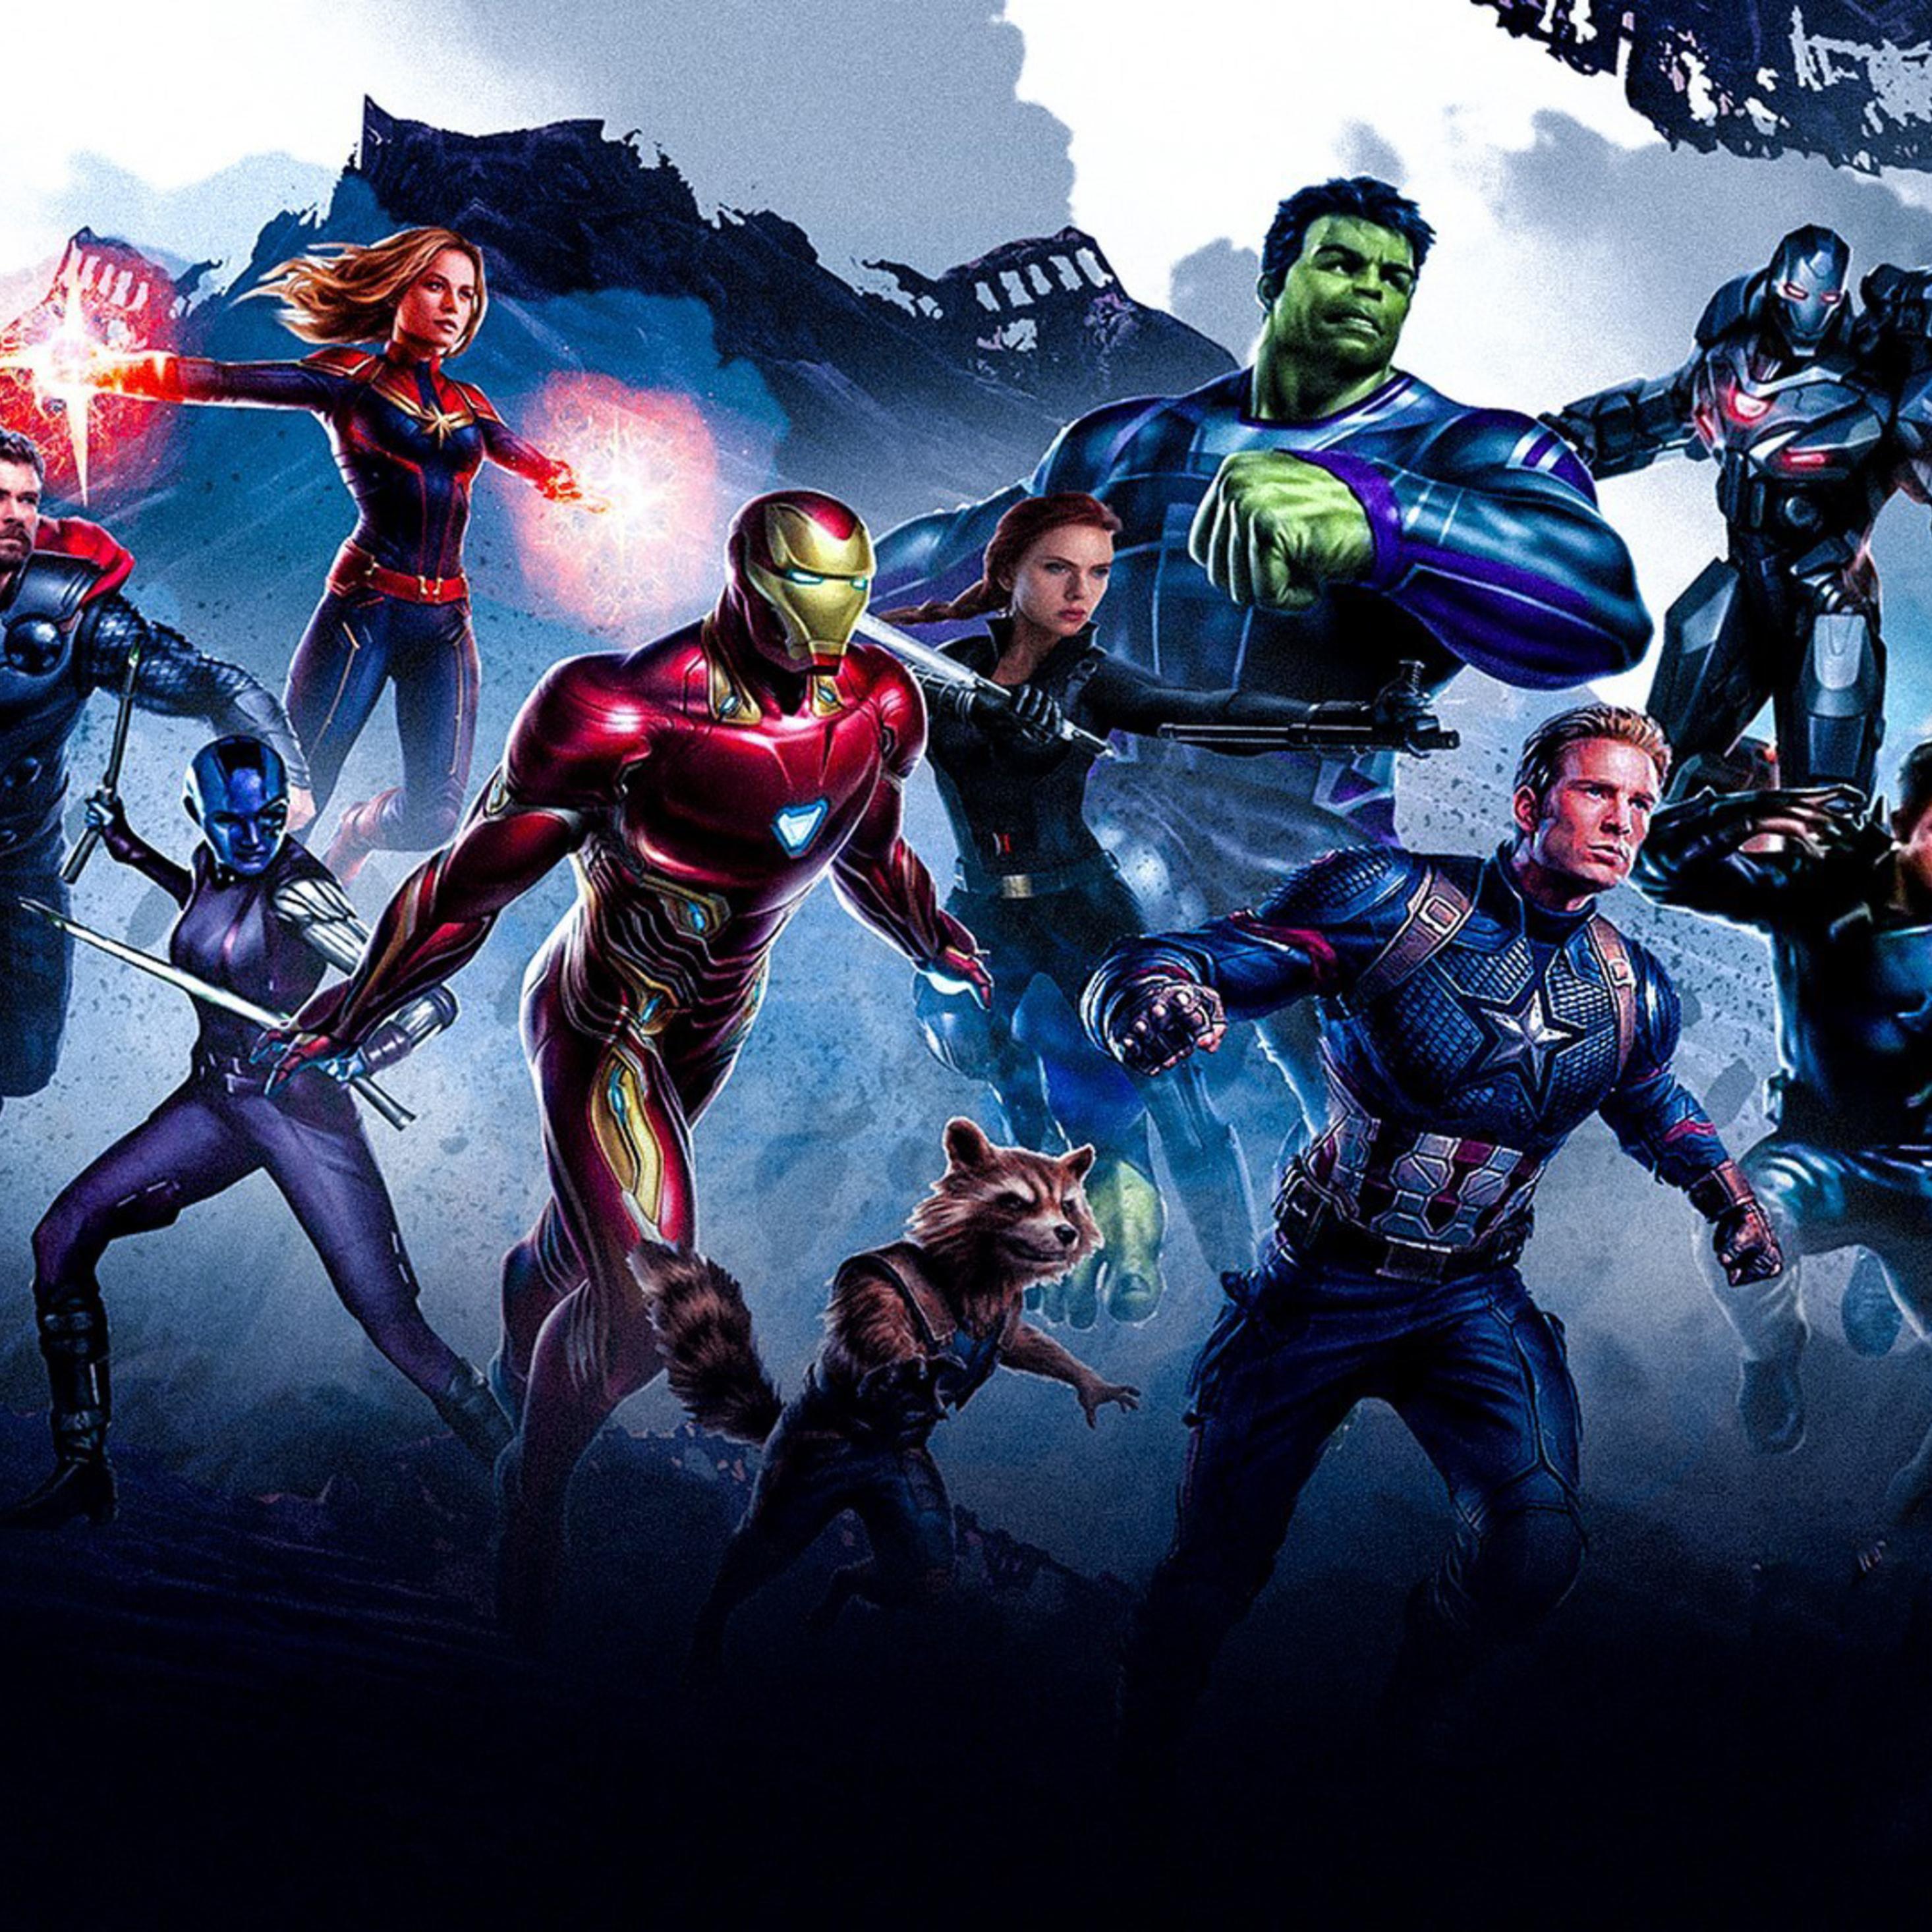 2932x2932 Avengers Endgame Poster Ipad Pro Retina Display Hd 4k